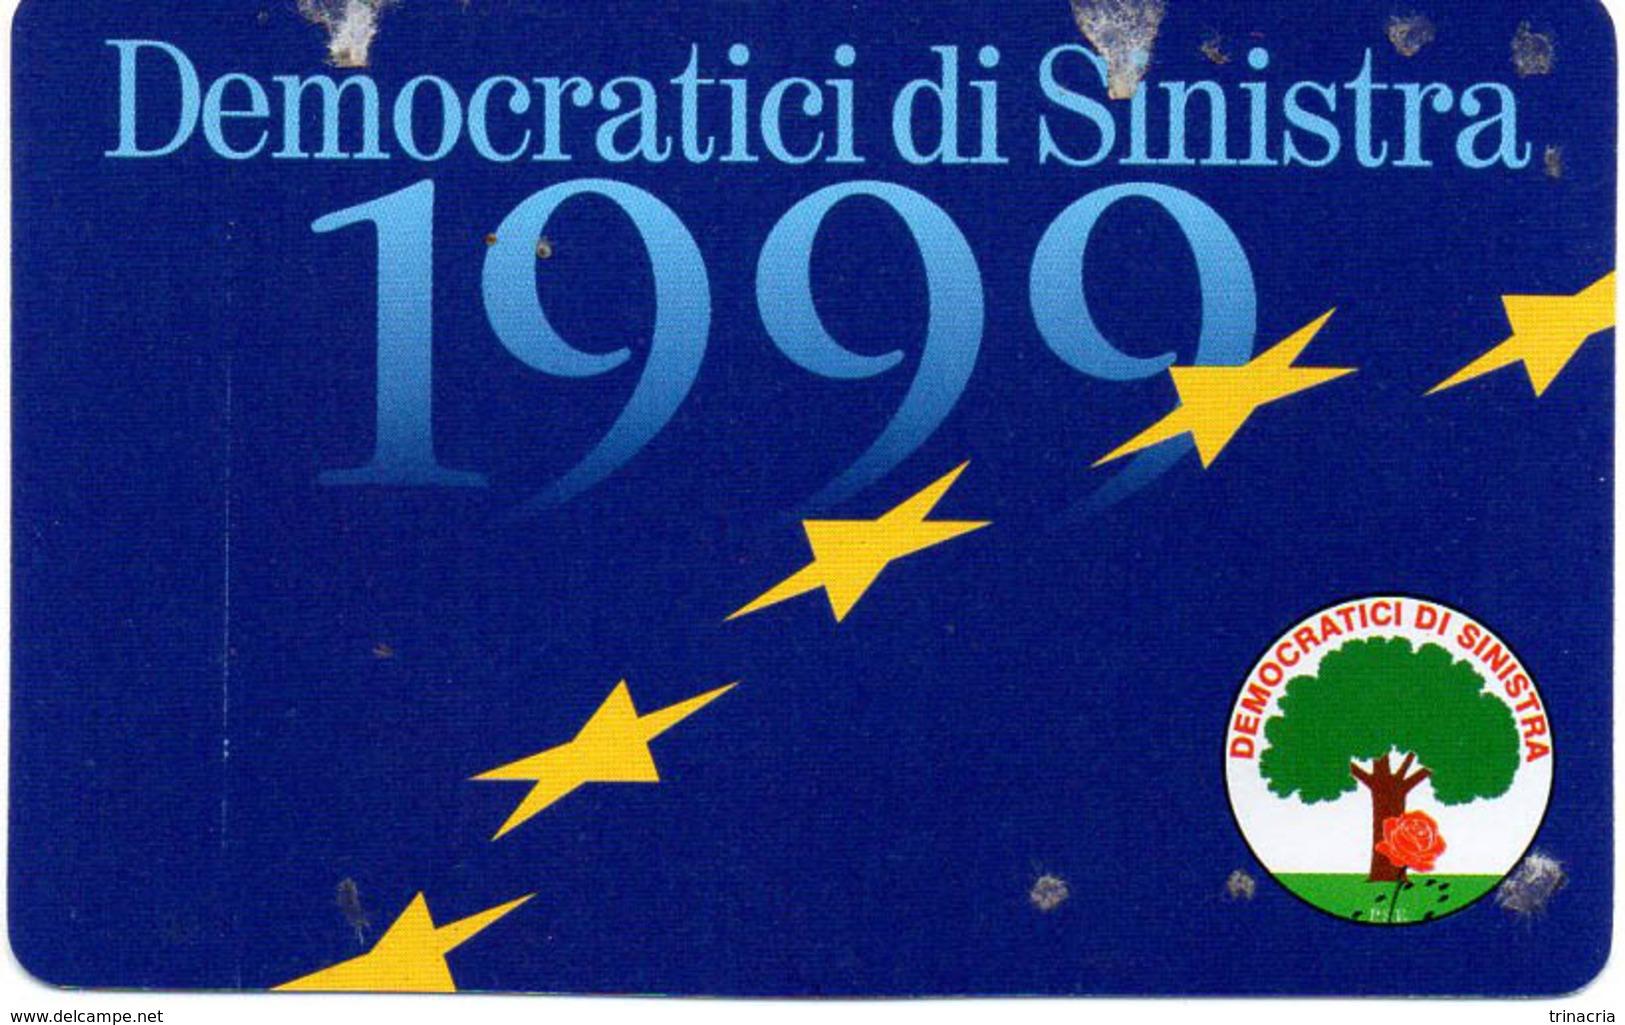 TESSERA D.S.1999 (DEMOCRATICI SINISTRA) - Documenti Storici